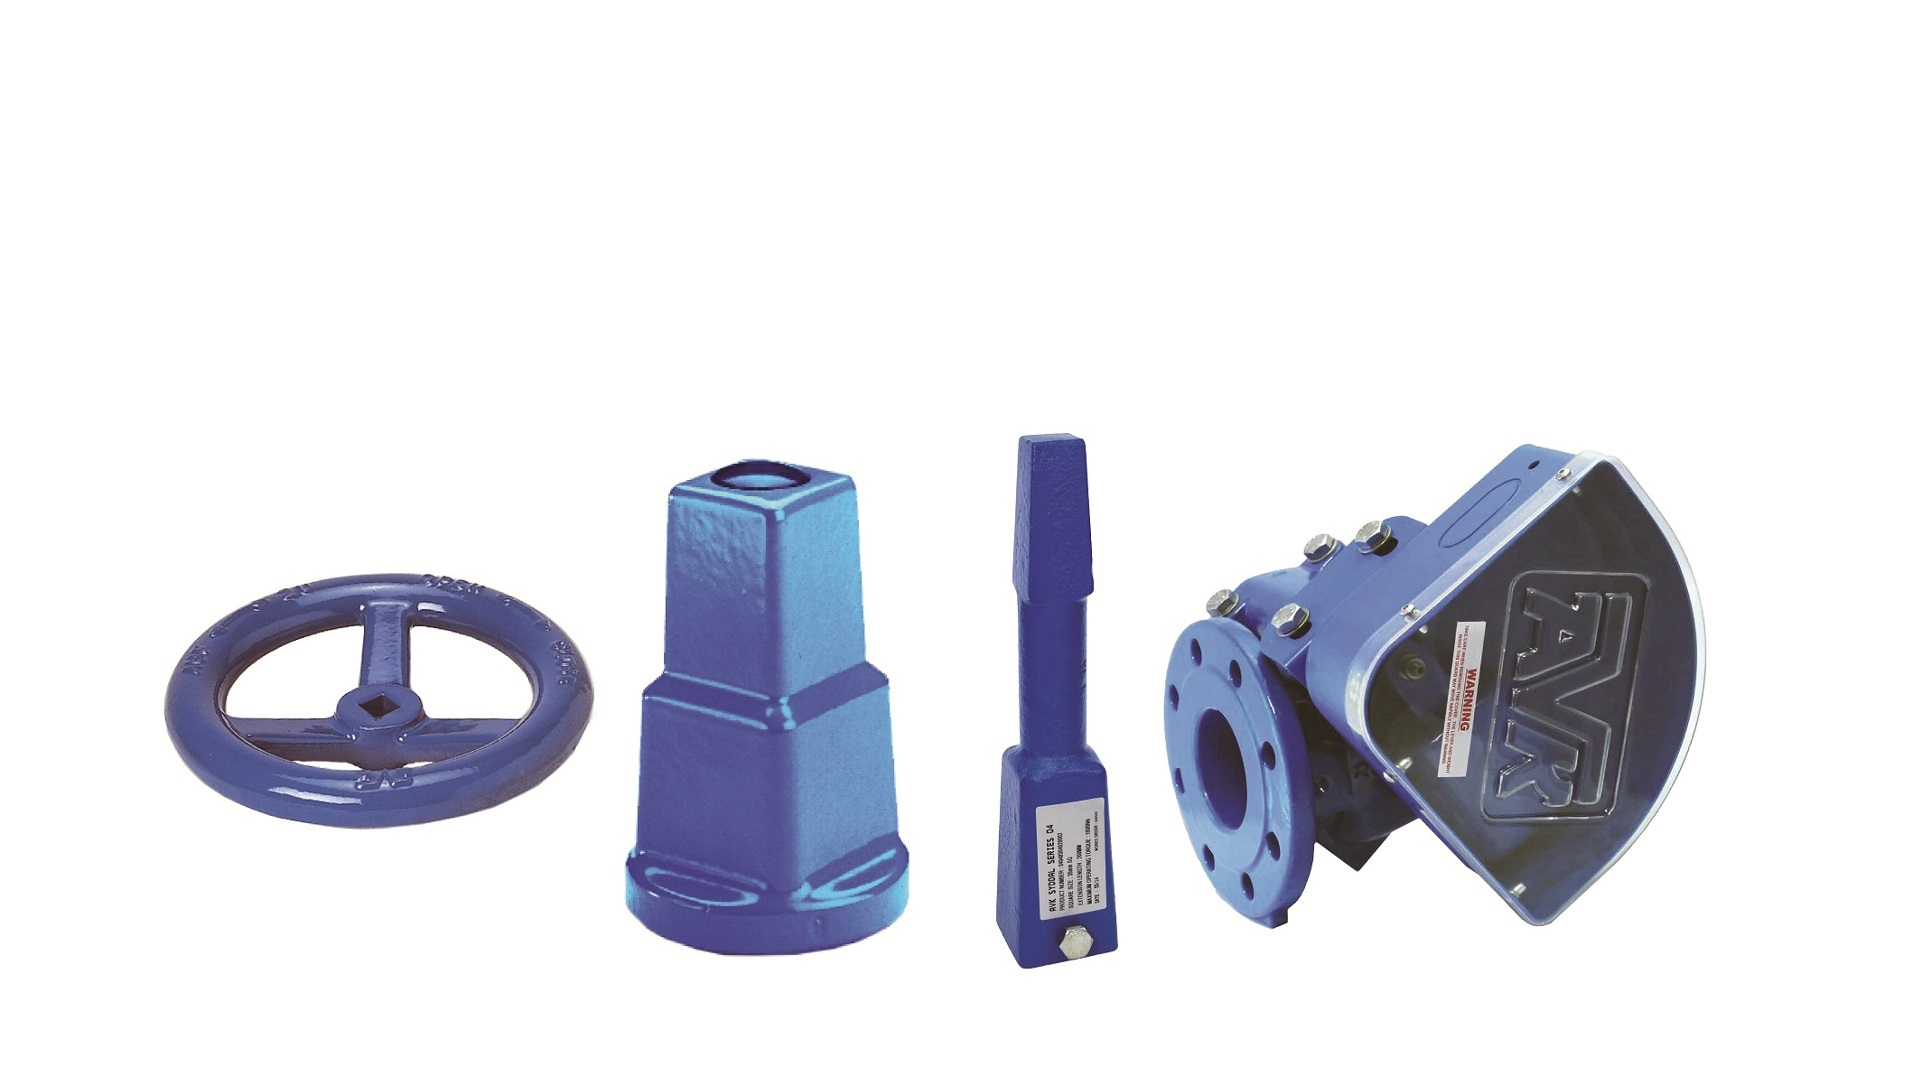 AVK valve accessories